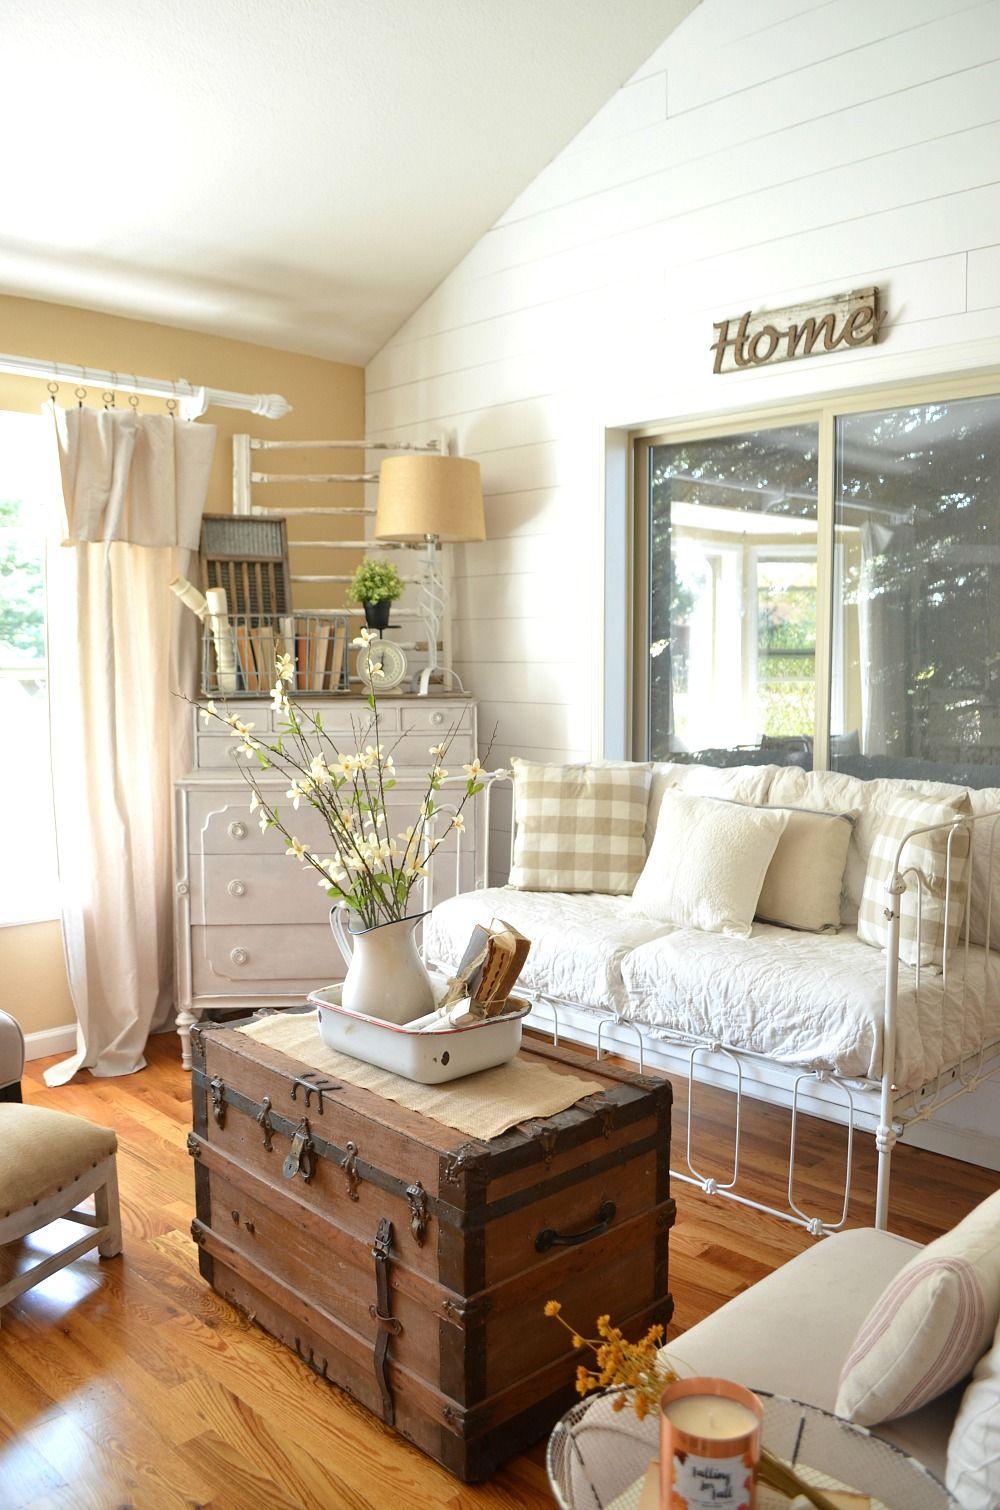 Home Decor Home Tour Farmhouse living room furniture